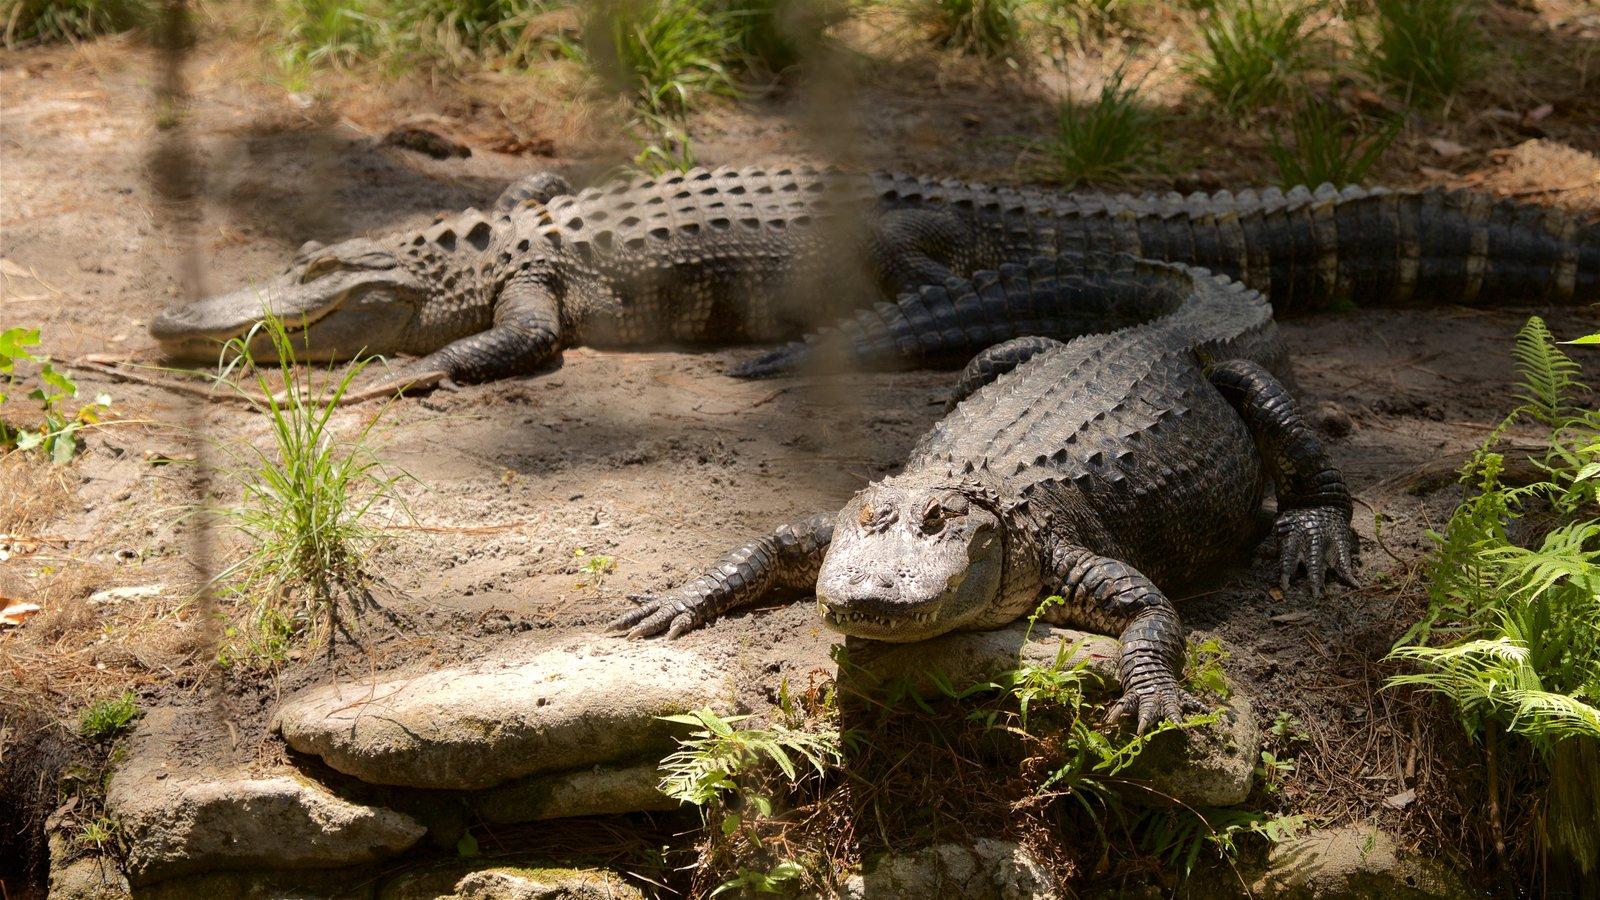 Okefenokee Swamp Park showing zoo animals and dangerous animals